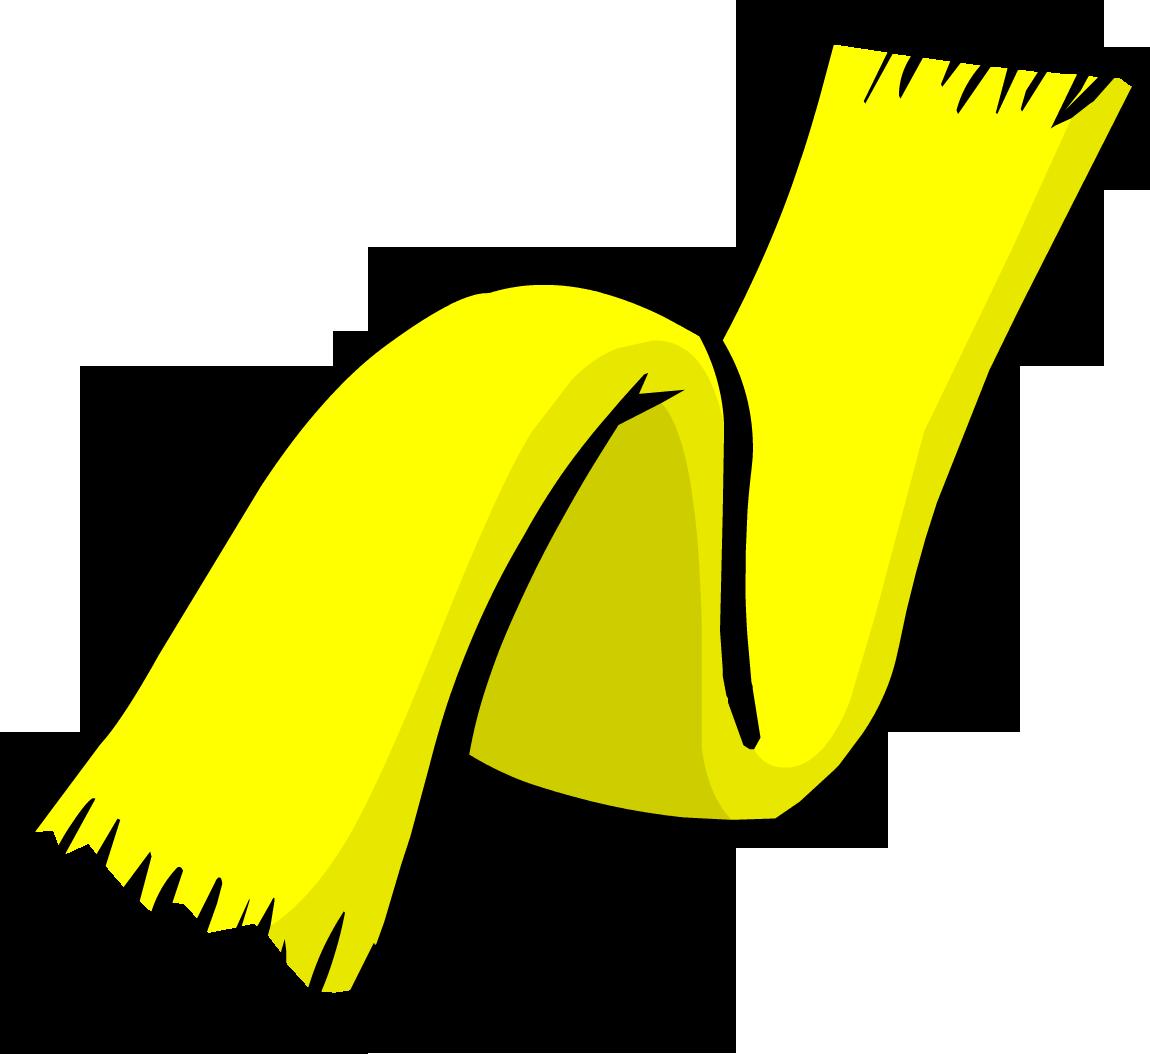 Clipart hat scarf. Yellow club penguin rewritten